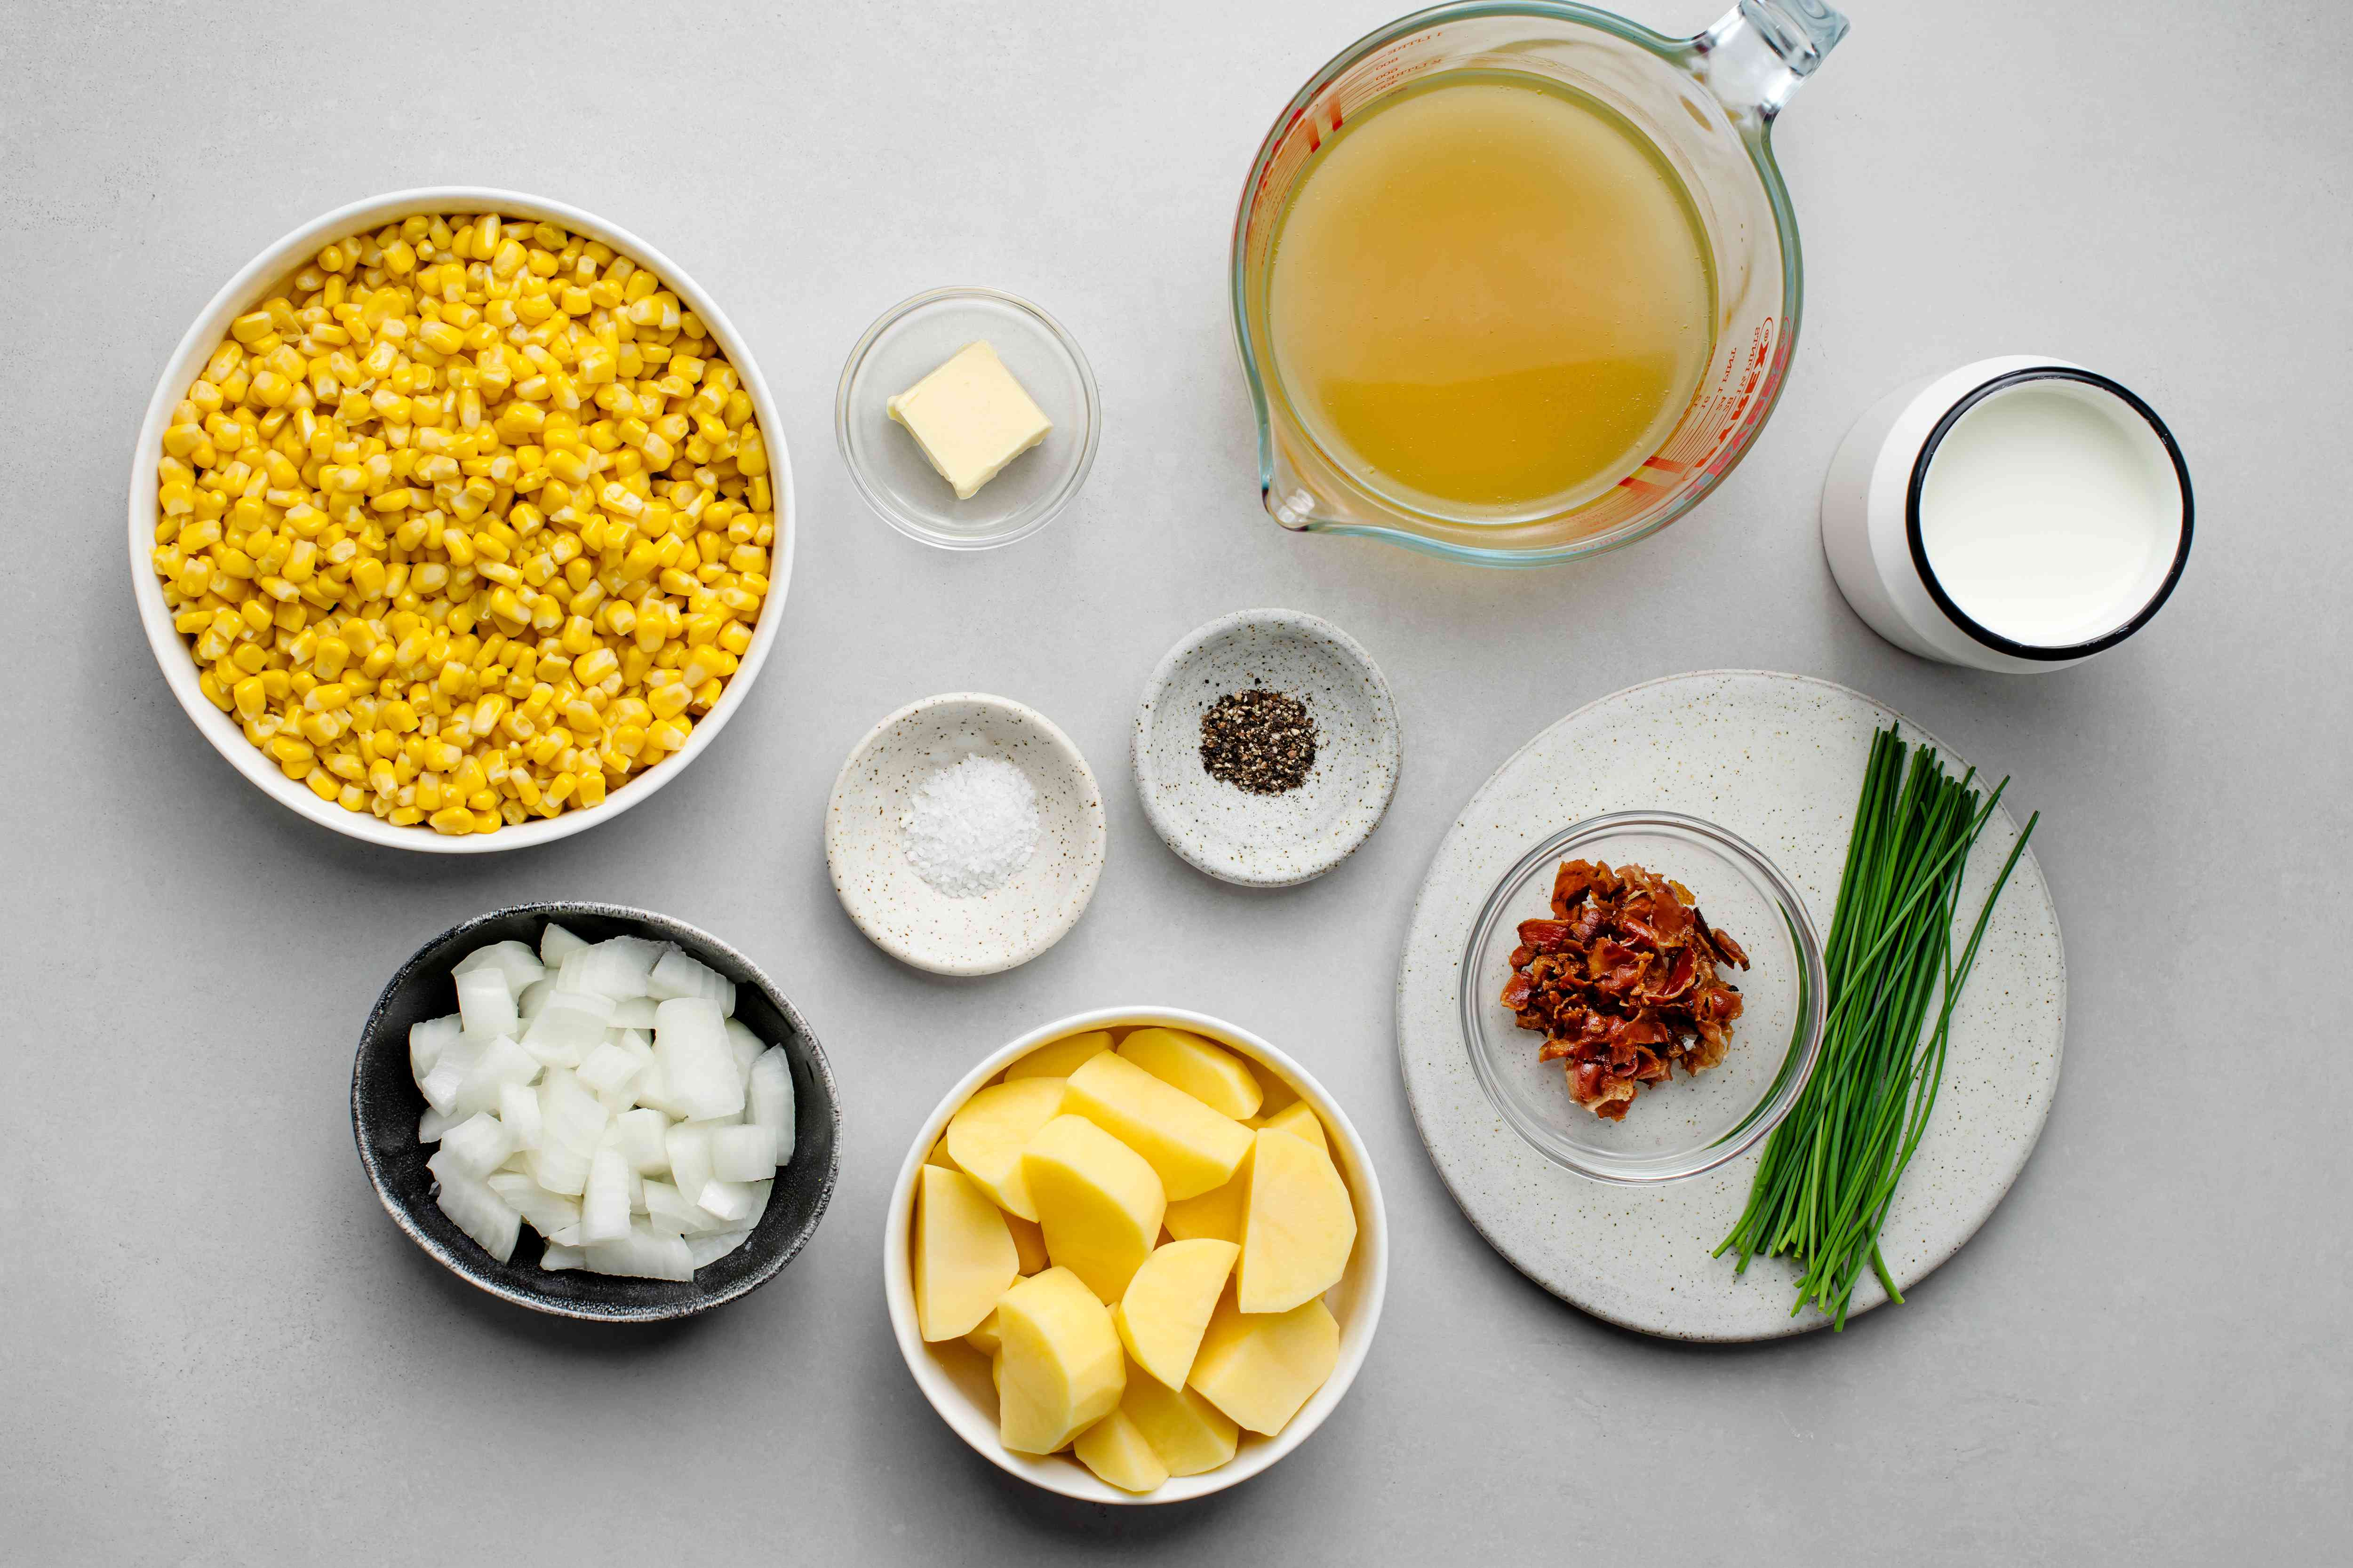 Slow Cooker Creamy Corn Chowder ingredients